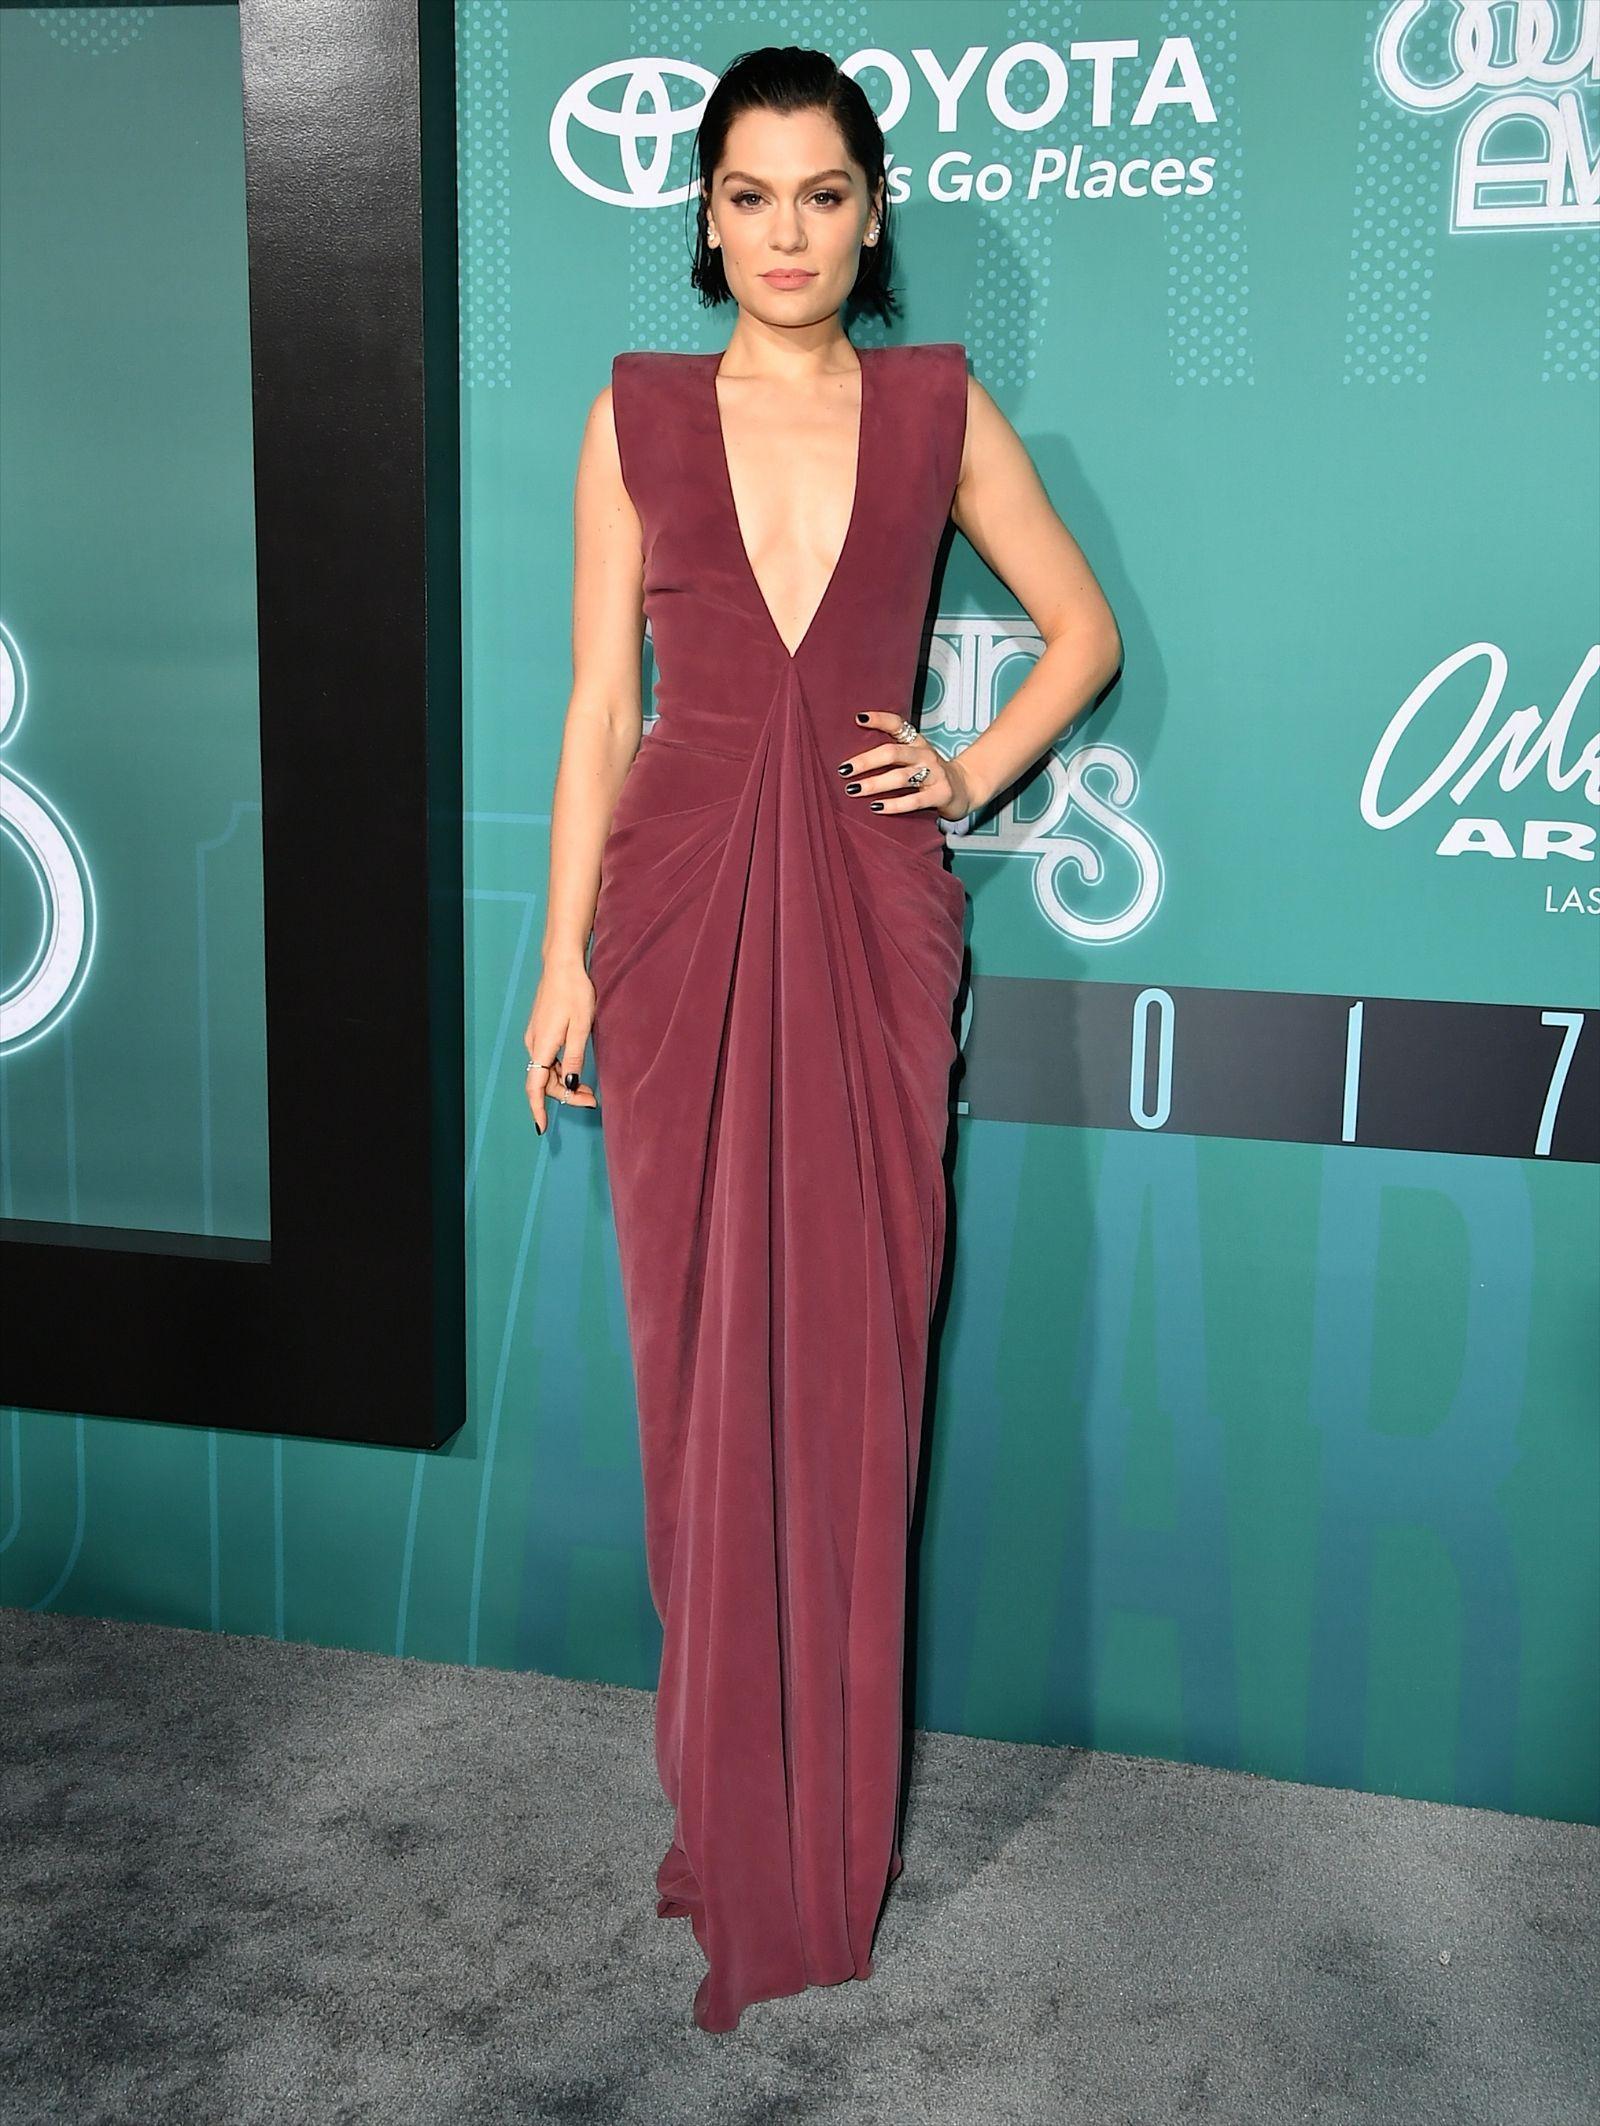 3f4b9e94cc Jessie J Hollywood Red Carpet, Red Carpet Dresses, Plunging Neckline,  Jessie, Celebrity